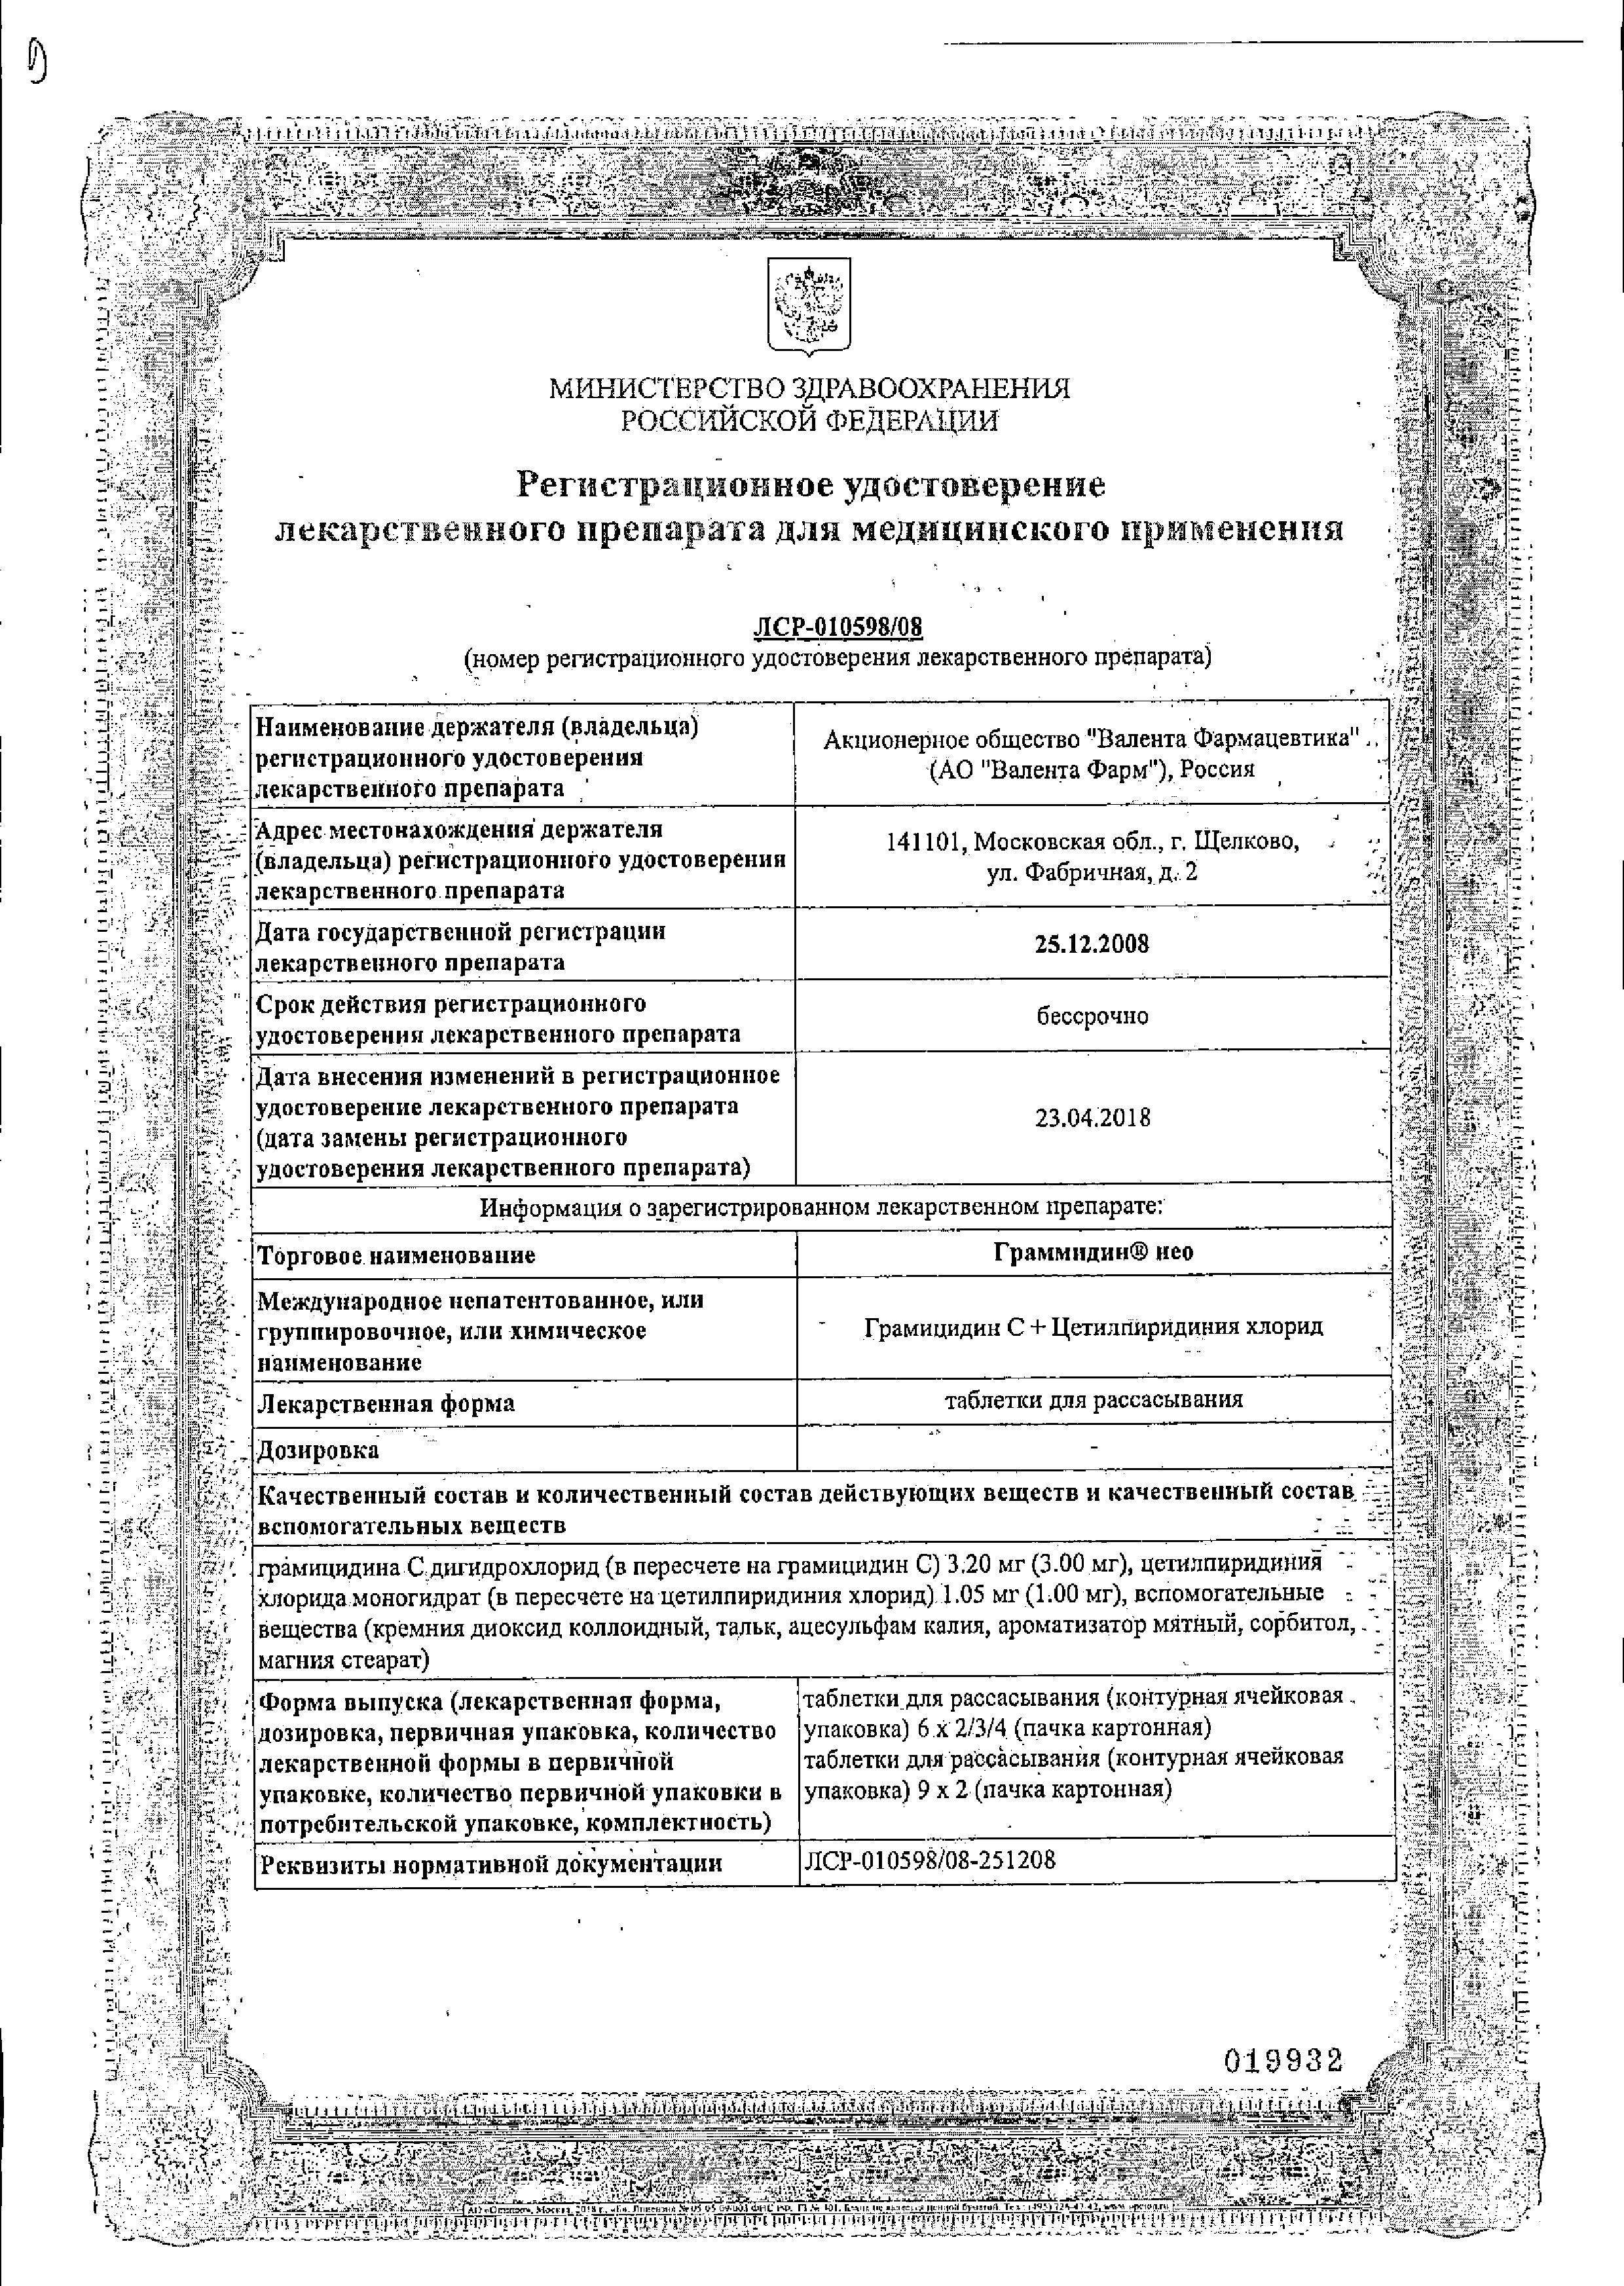 Граммидин нео сертификат